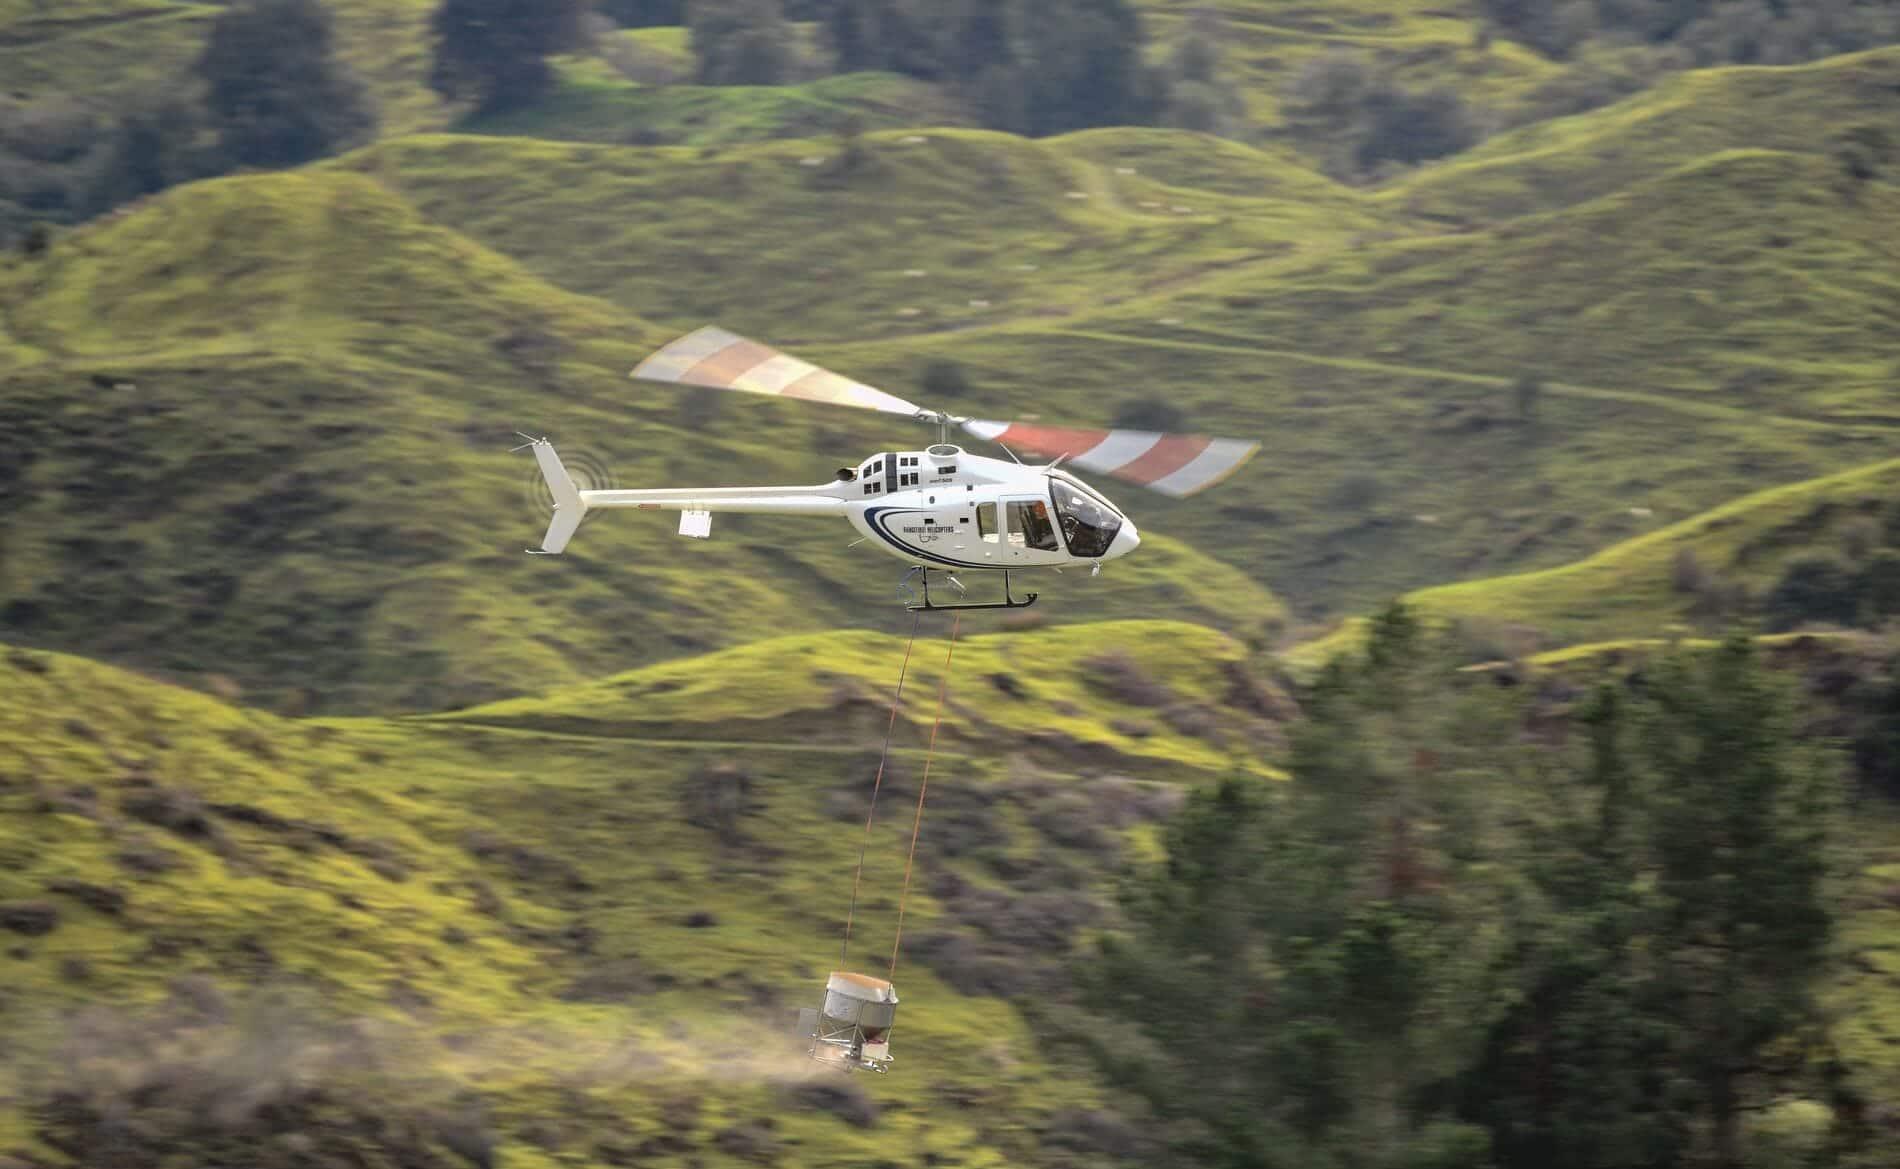 Web_Hero-CML_505_Rangitikei-Helicopters_JRX 1636_2018